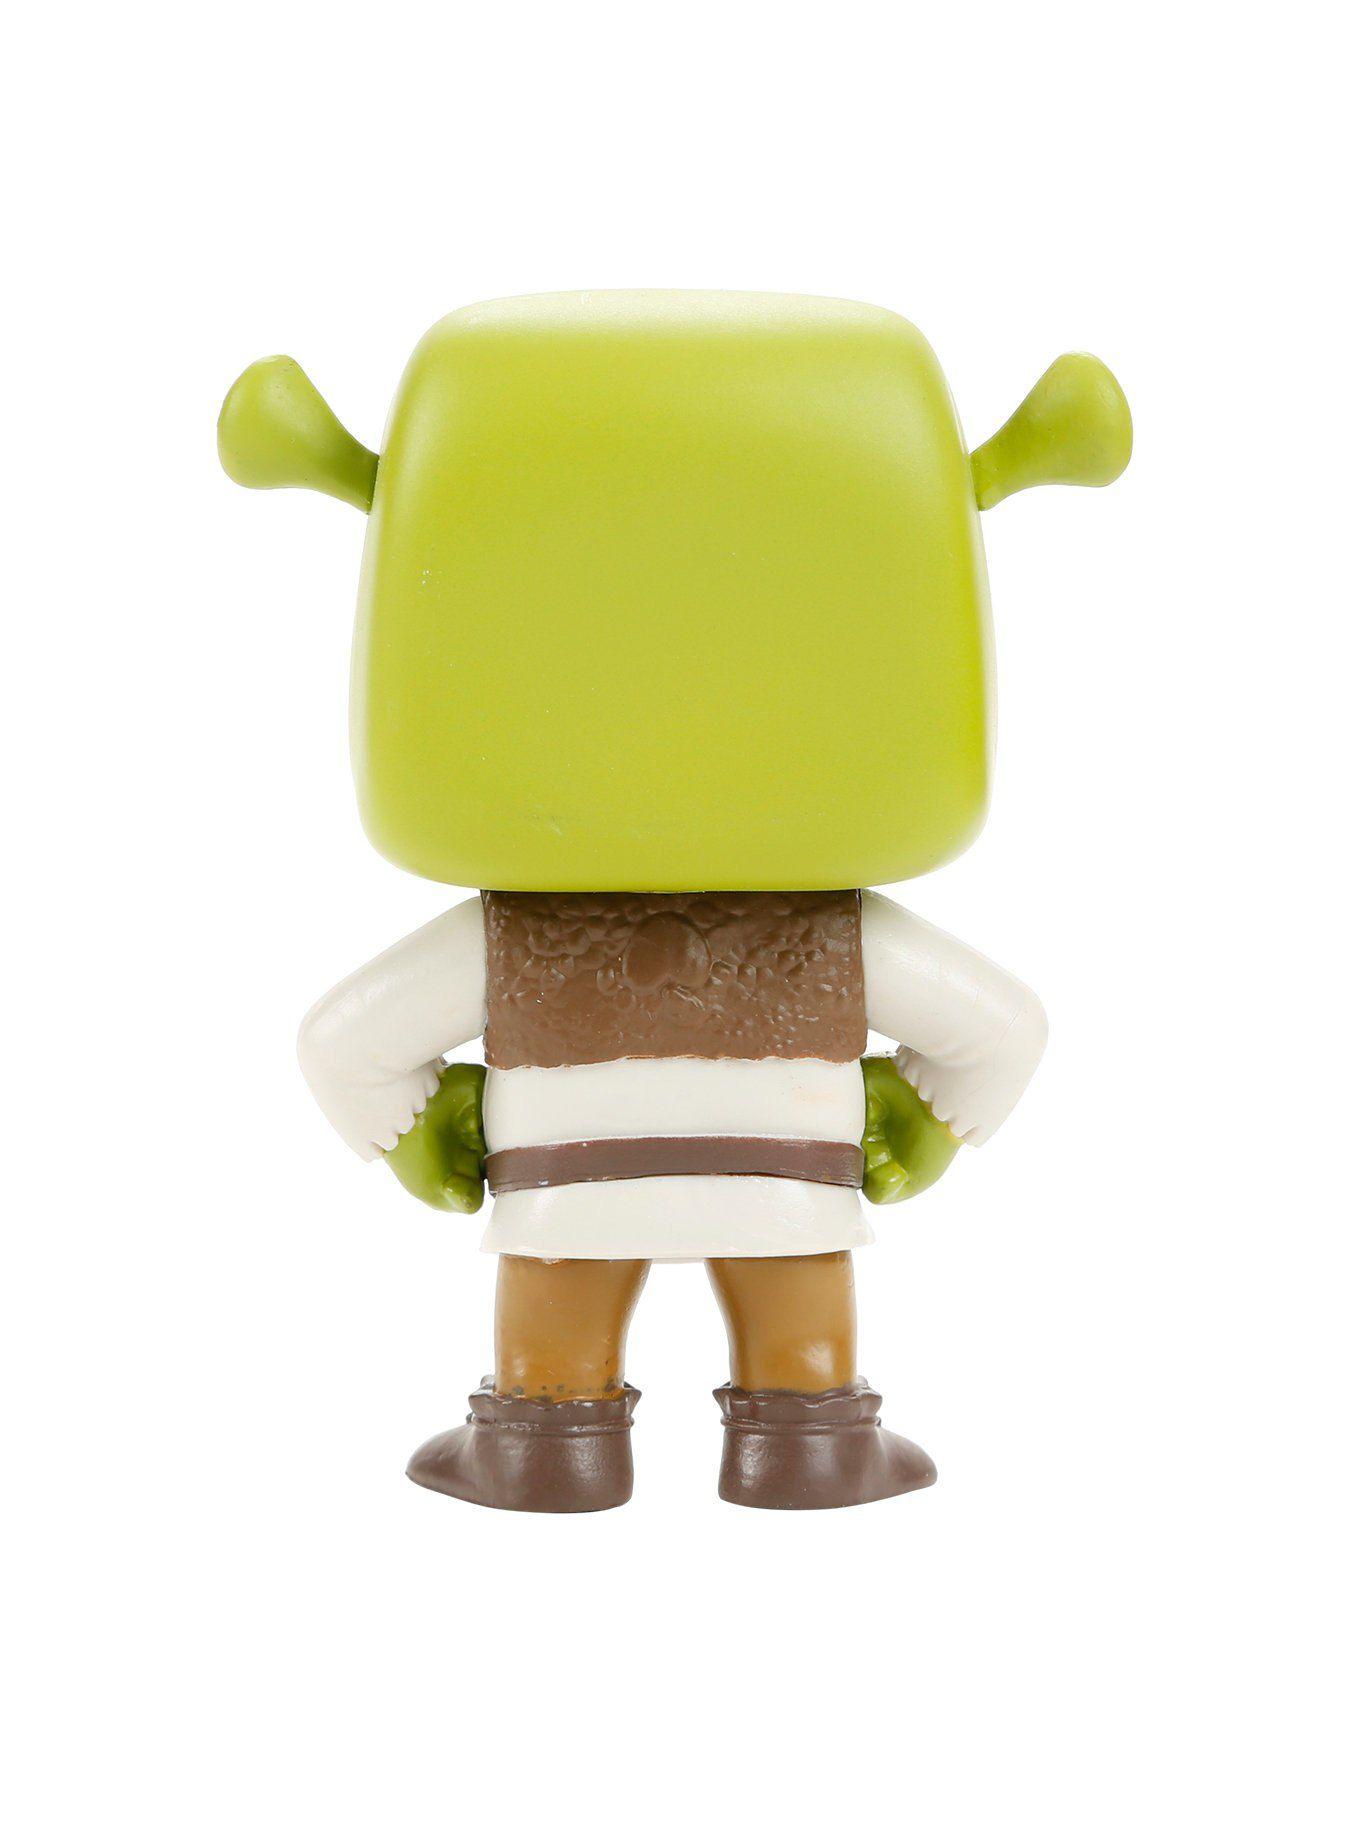 Shrek #278 - Funko Pop! Movies